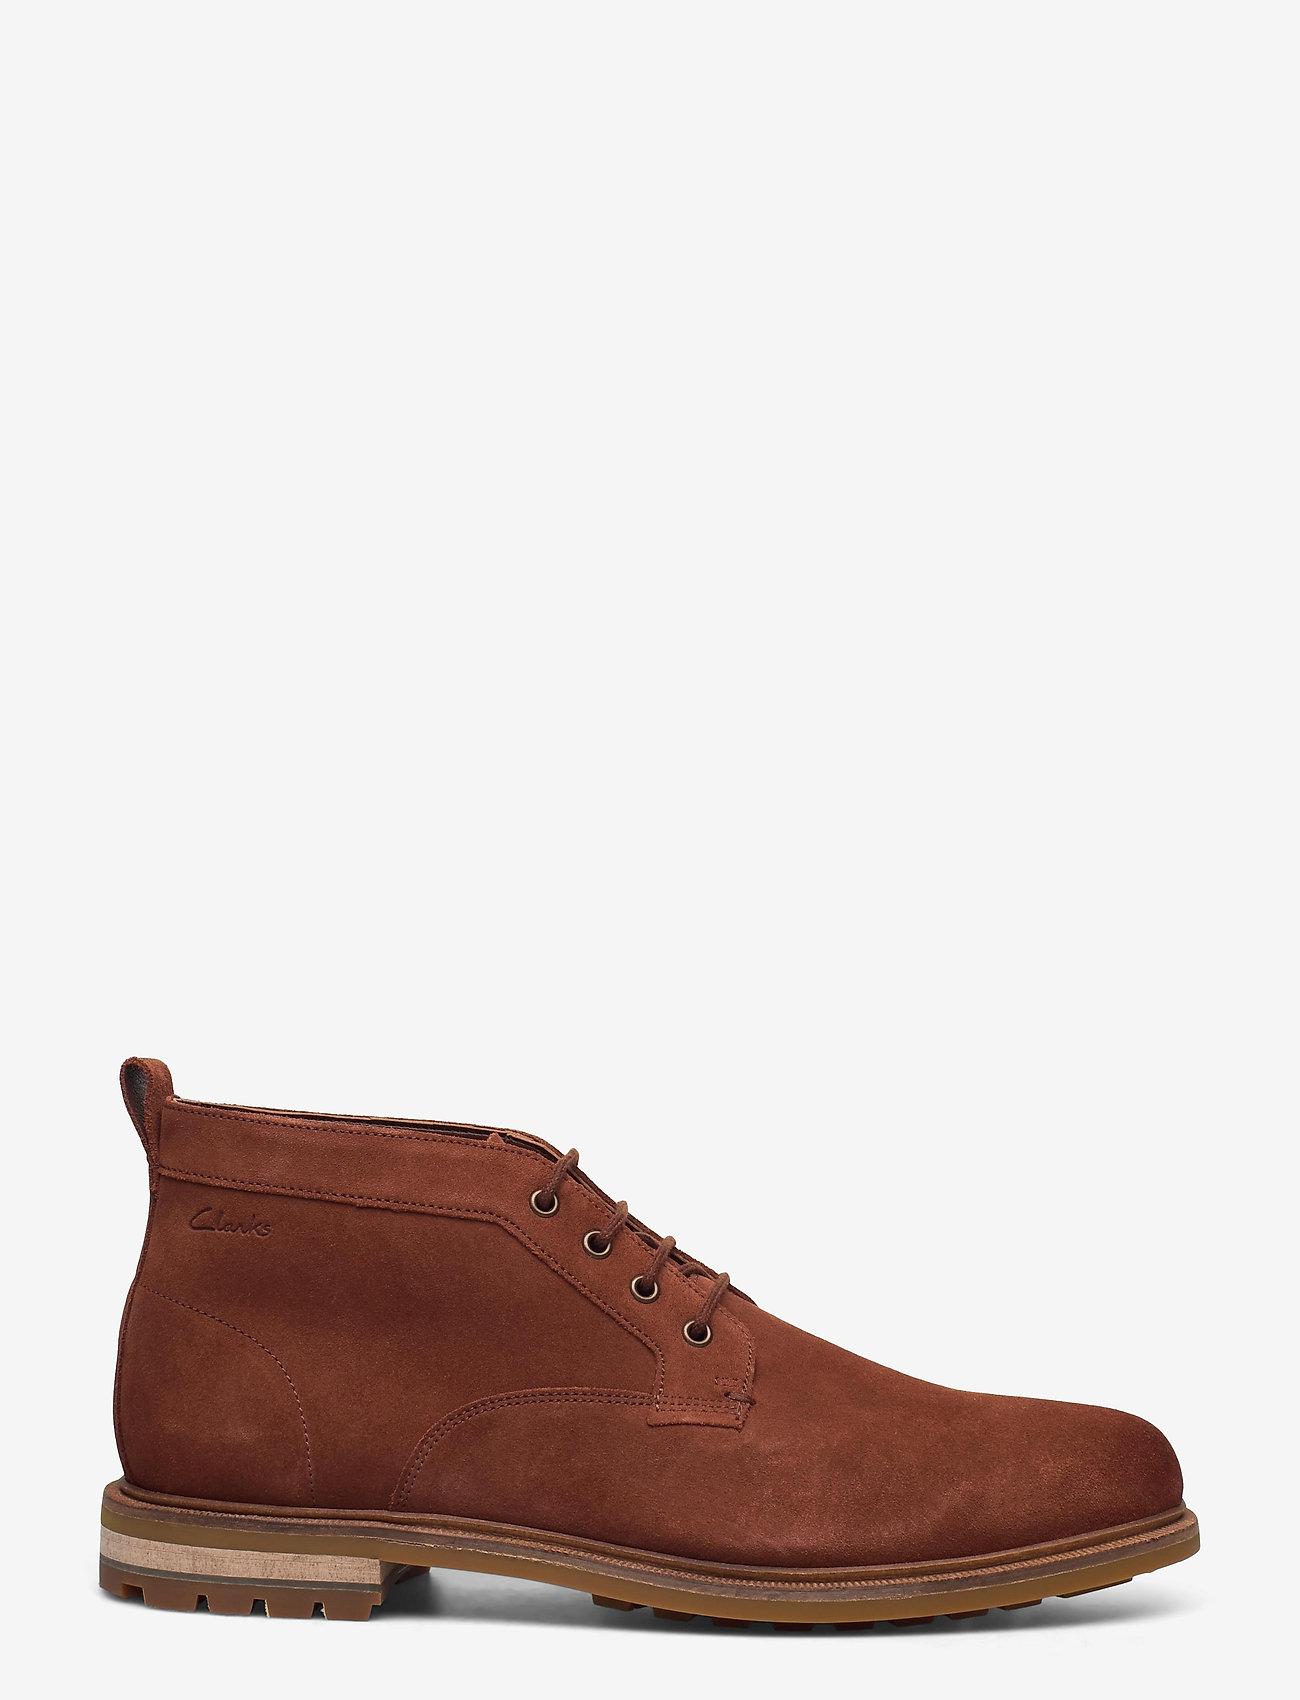 Clarks - Foxwell Mid - desert boots - british tan - 1